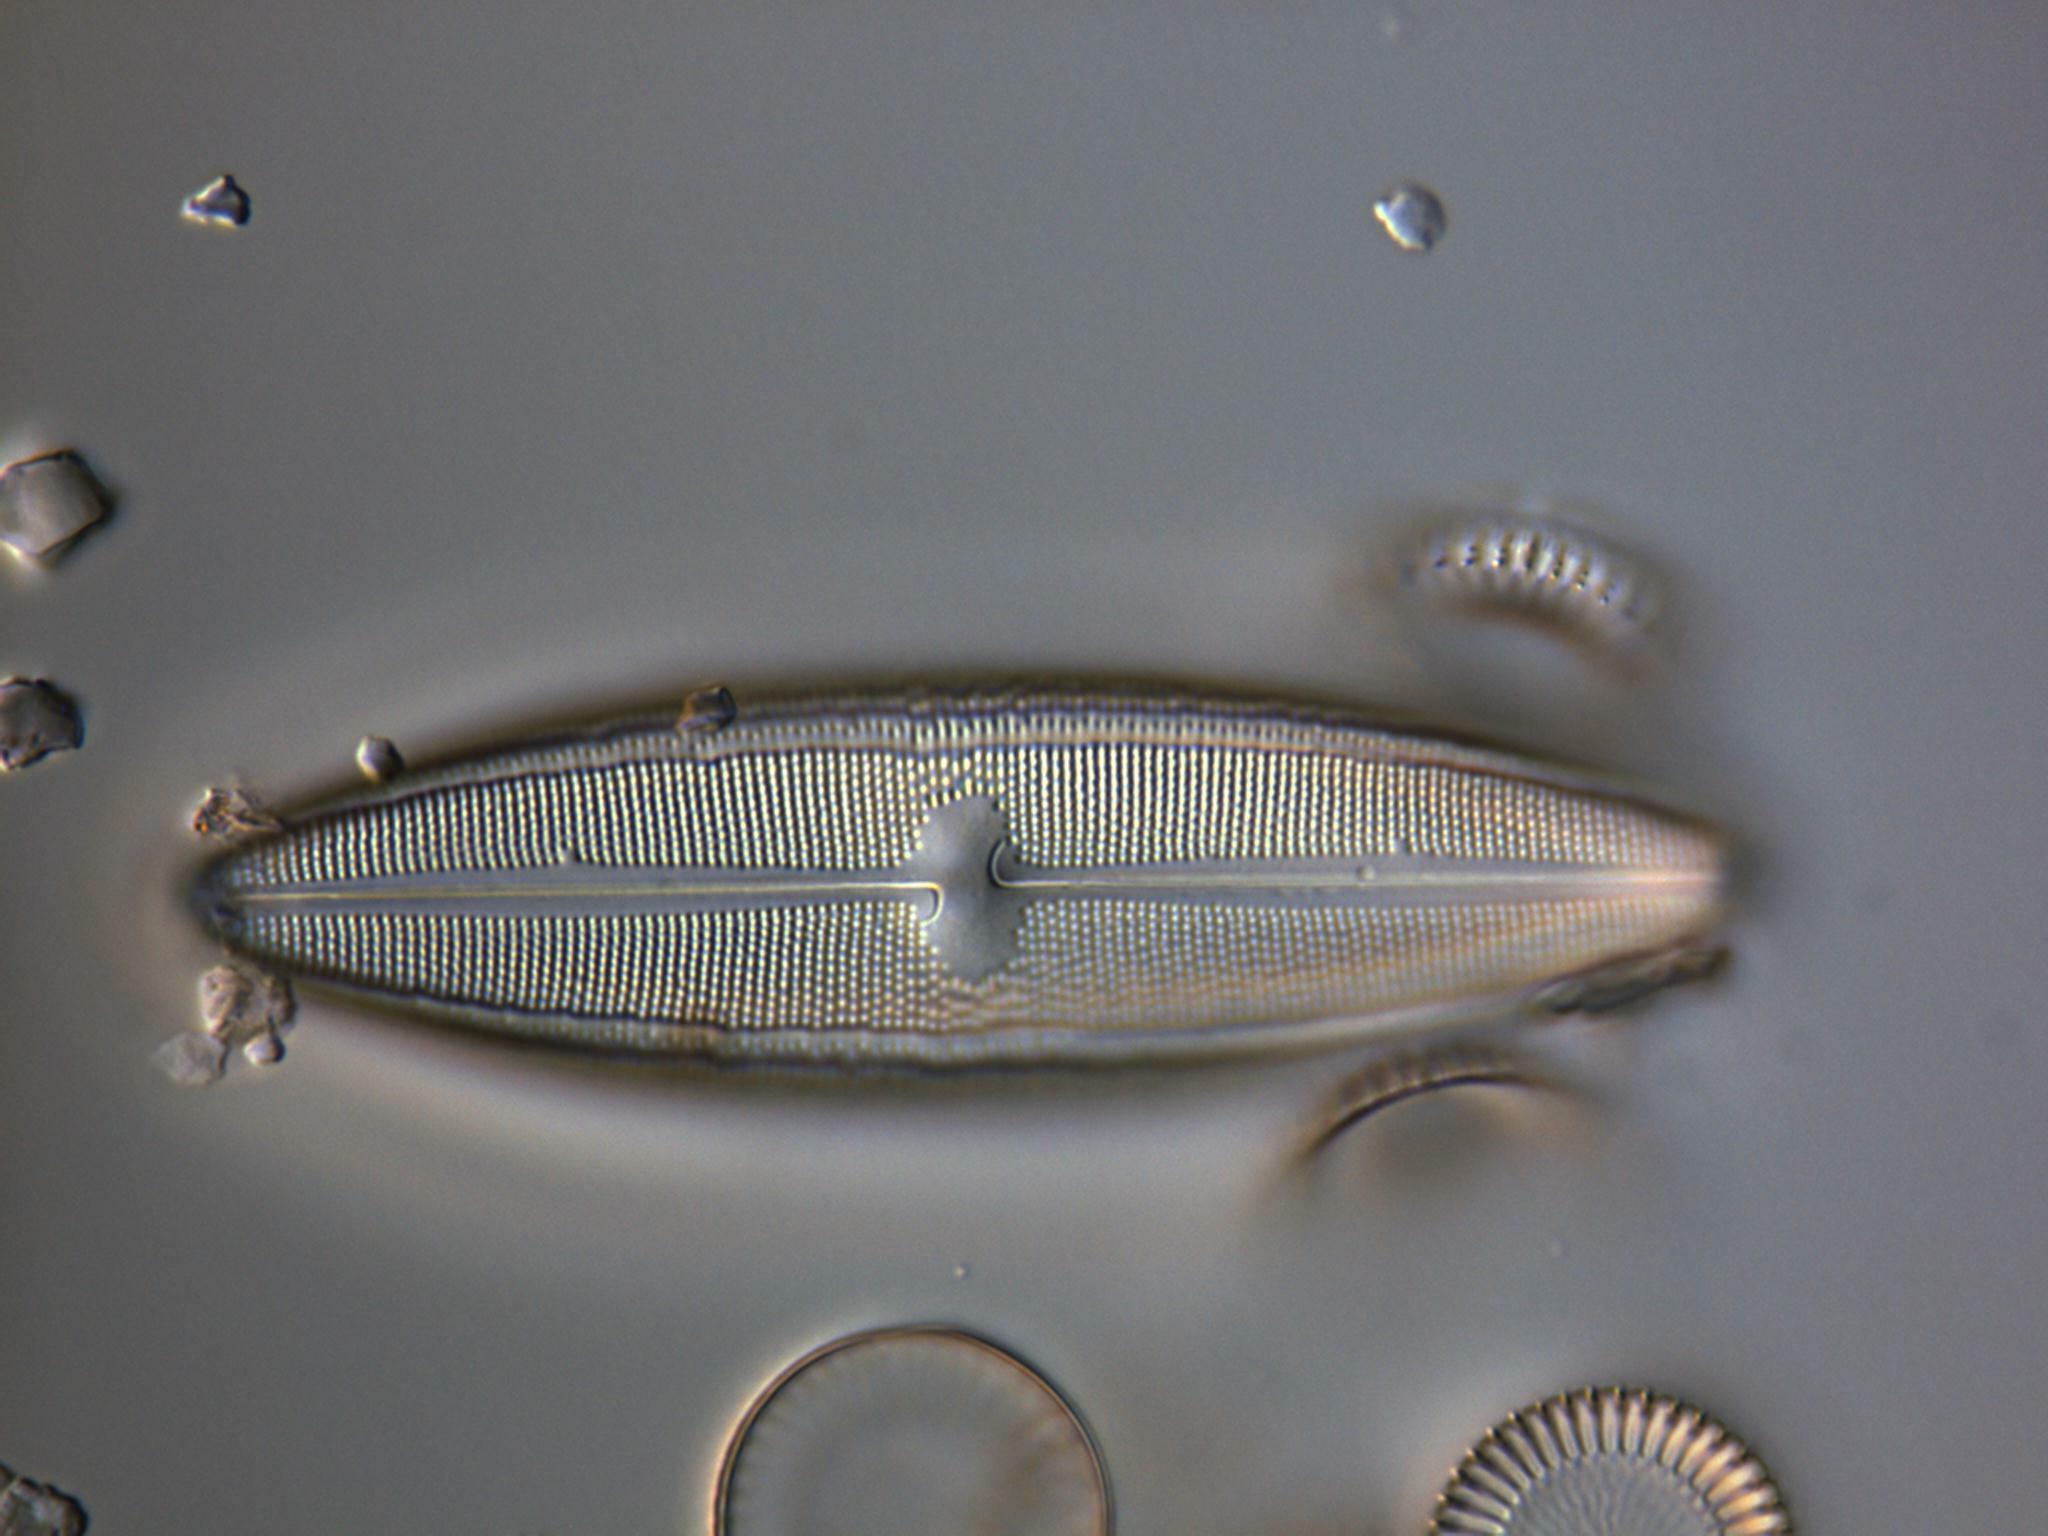 67 5 N iridis var ampliatum CIRCLE copy